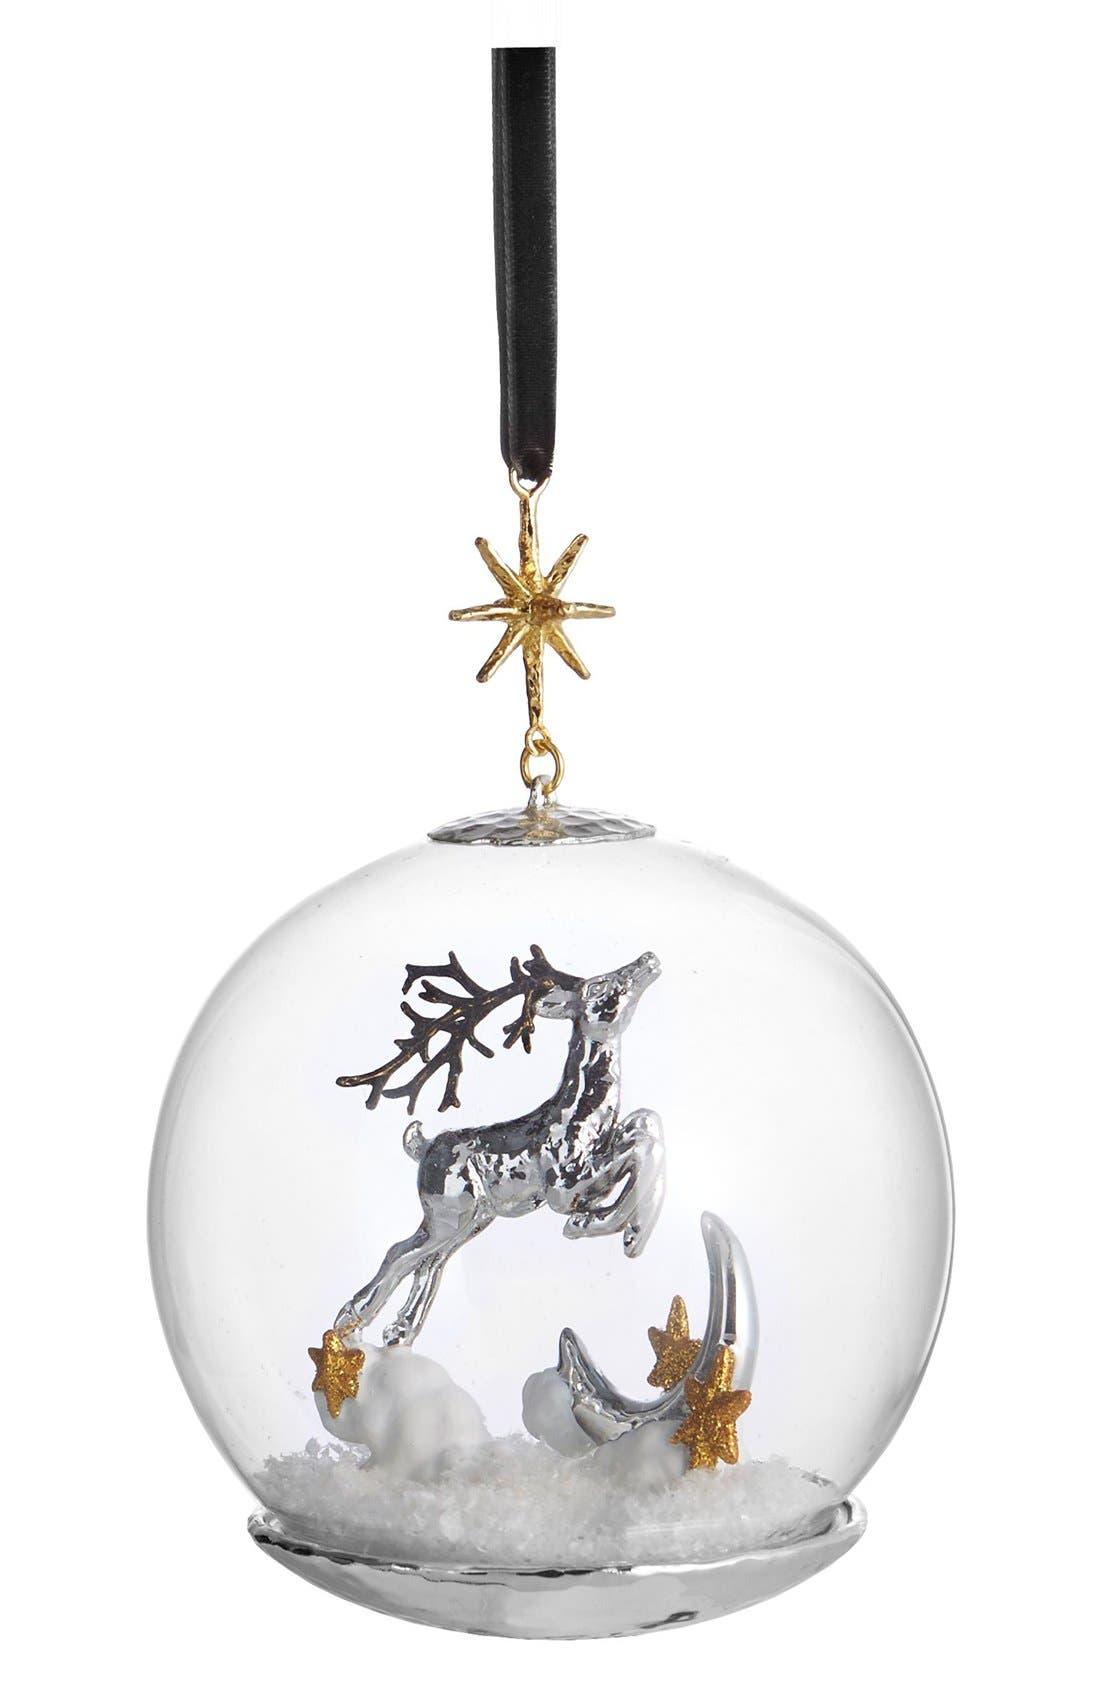 Reindeer Snow Globe Ornament,                             Main thumbnail 1, color,                             Metallic Silver/ Gold